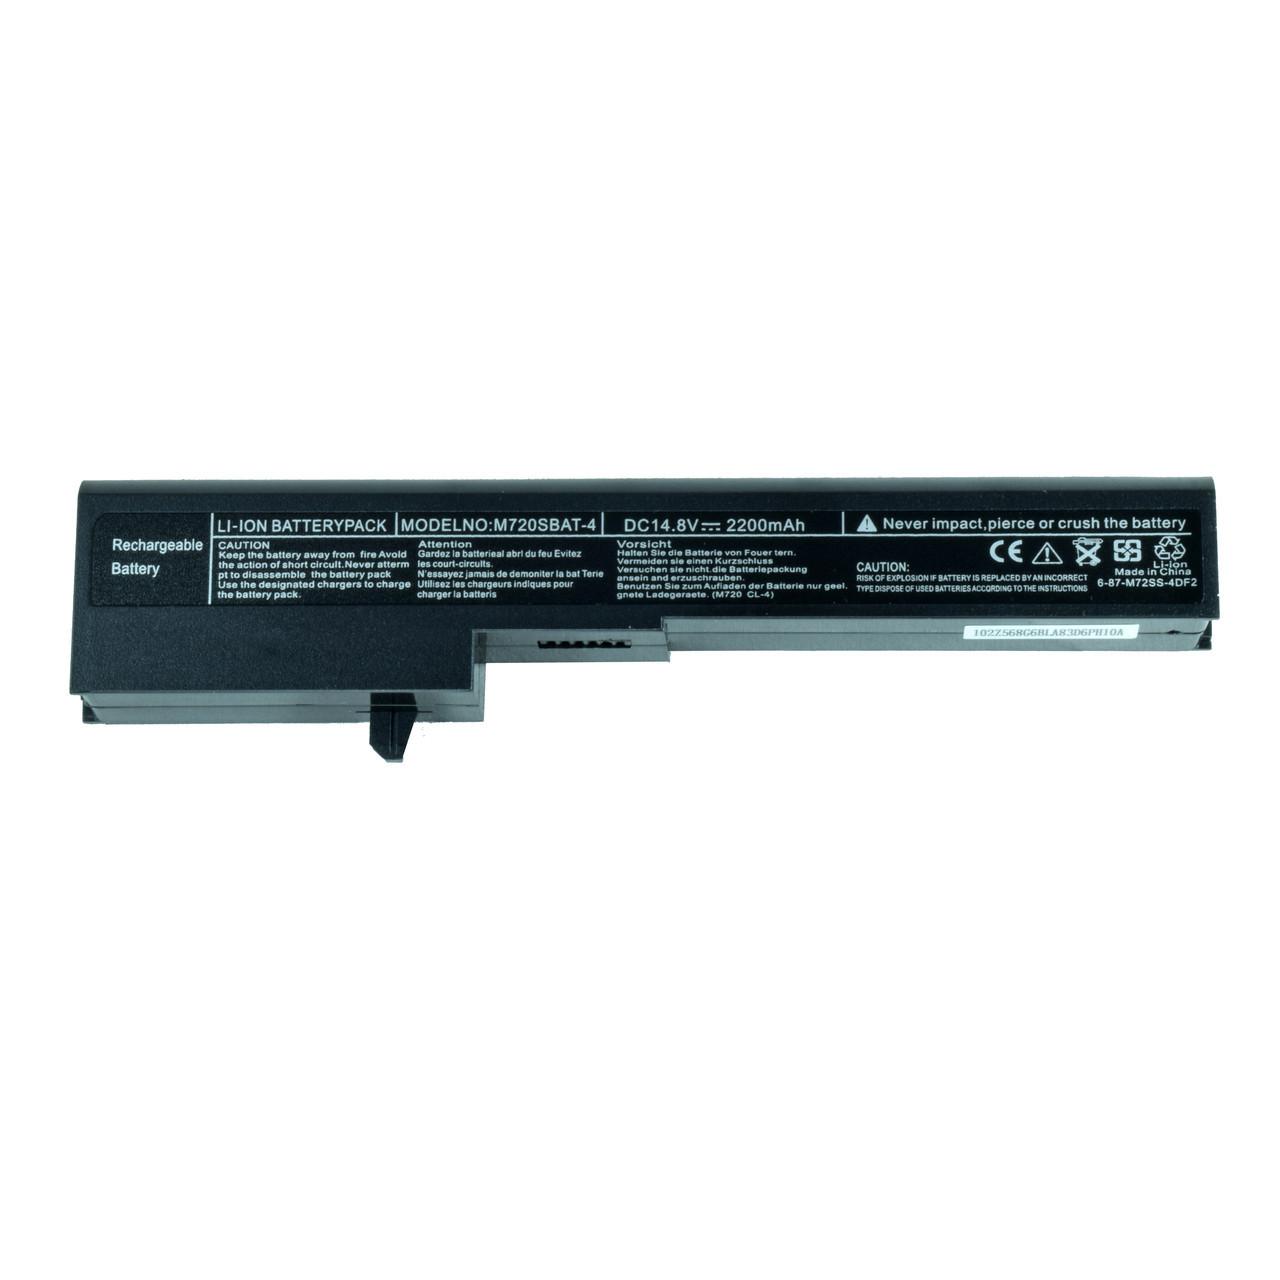 Батарея для ноутбука CLEVO M720SBAT M720SBAT-4 M720BAT-4 M720BAT-8 M720SBAT-8 87-M72SS-4DF2